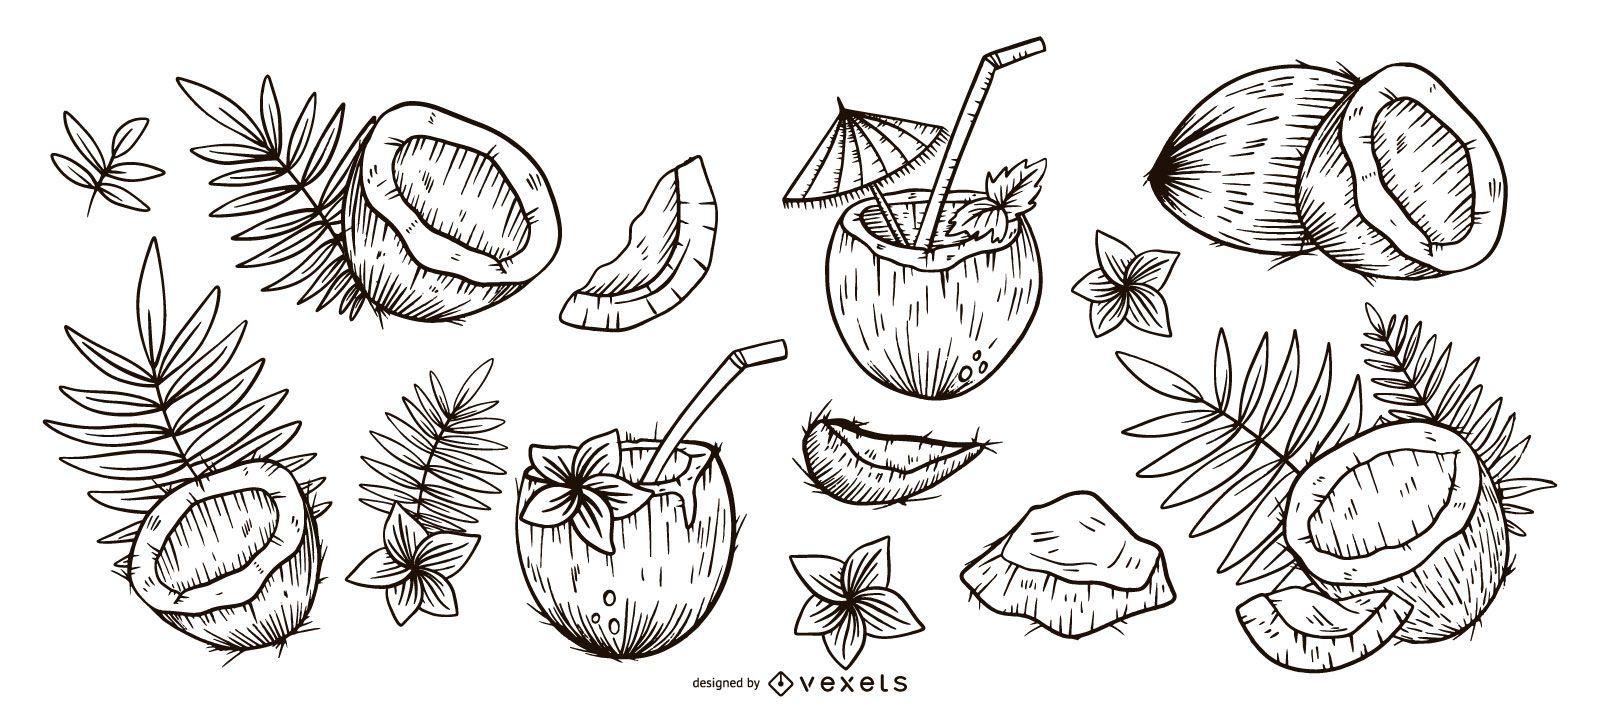 Coconut hand drawn set